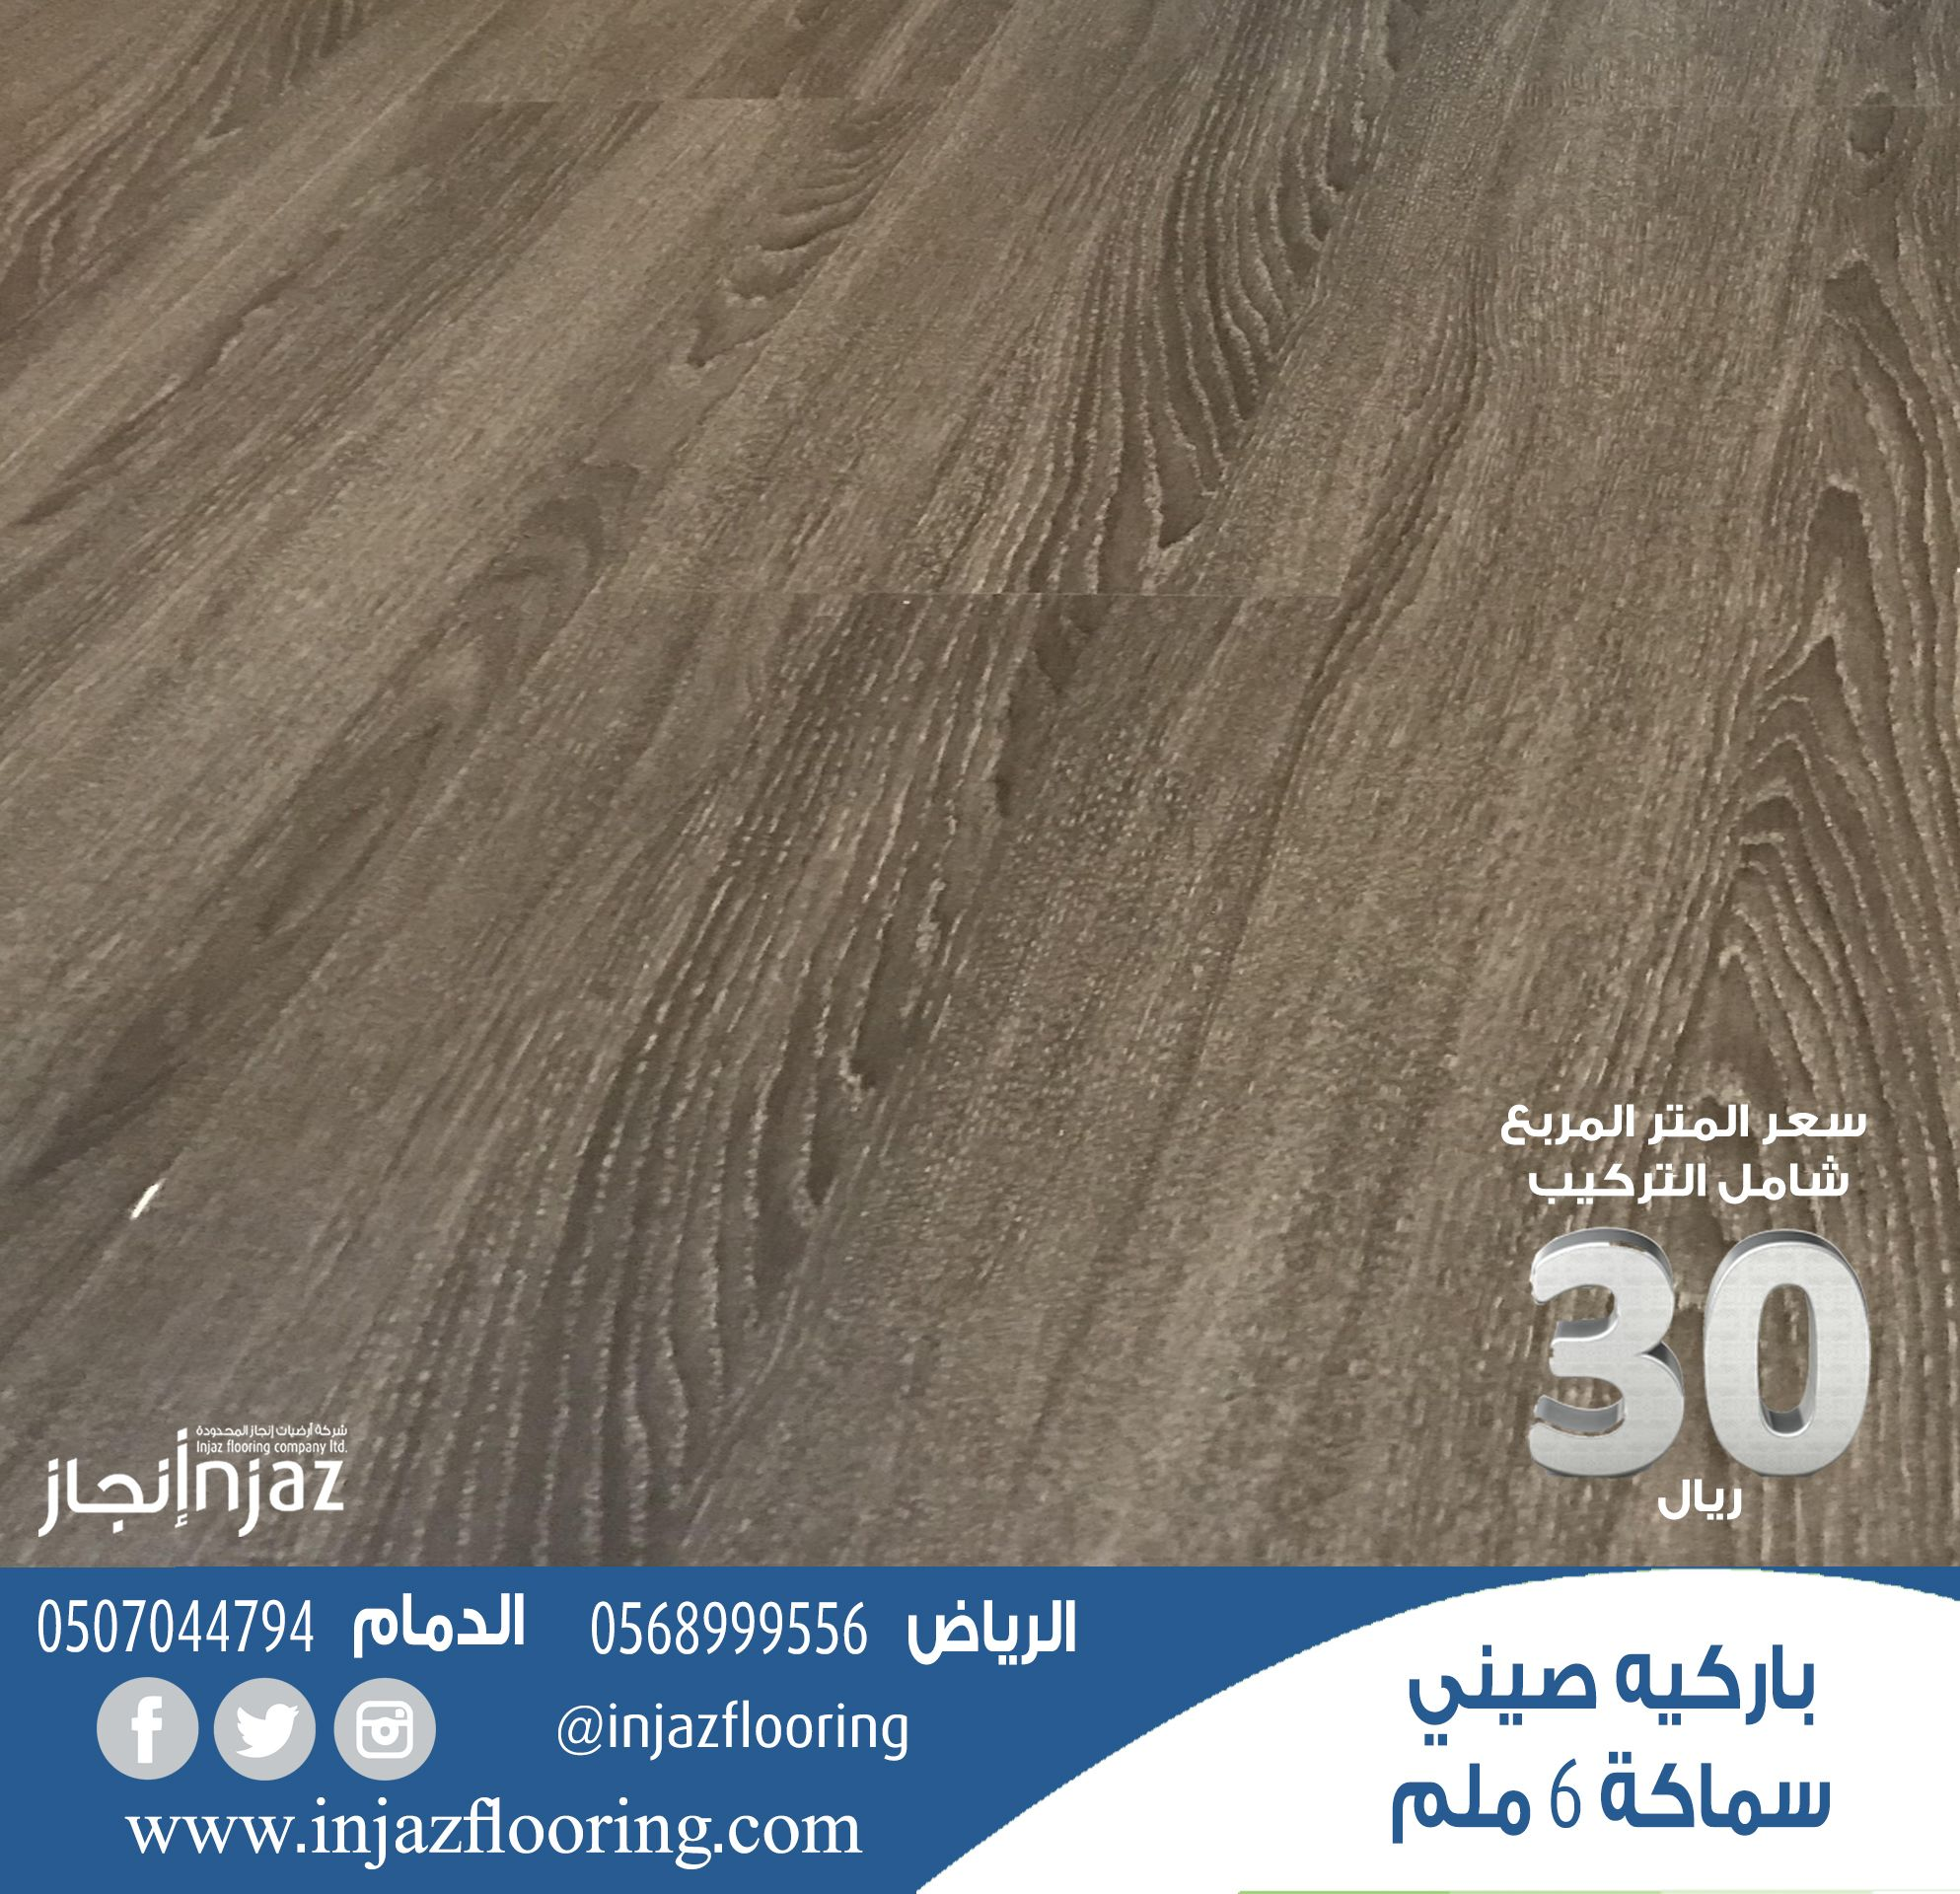 باركيه صيني شامل التركيب 30 ريال Wood Laminate Flooring Wood Laminate Laminate Flooring